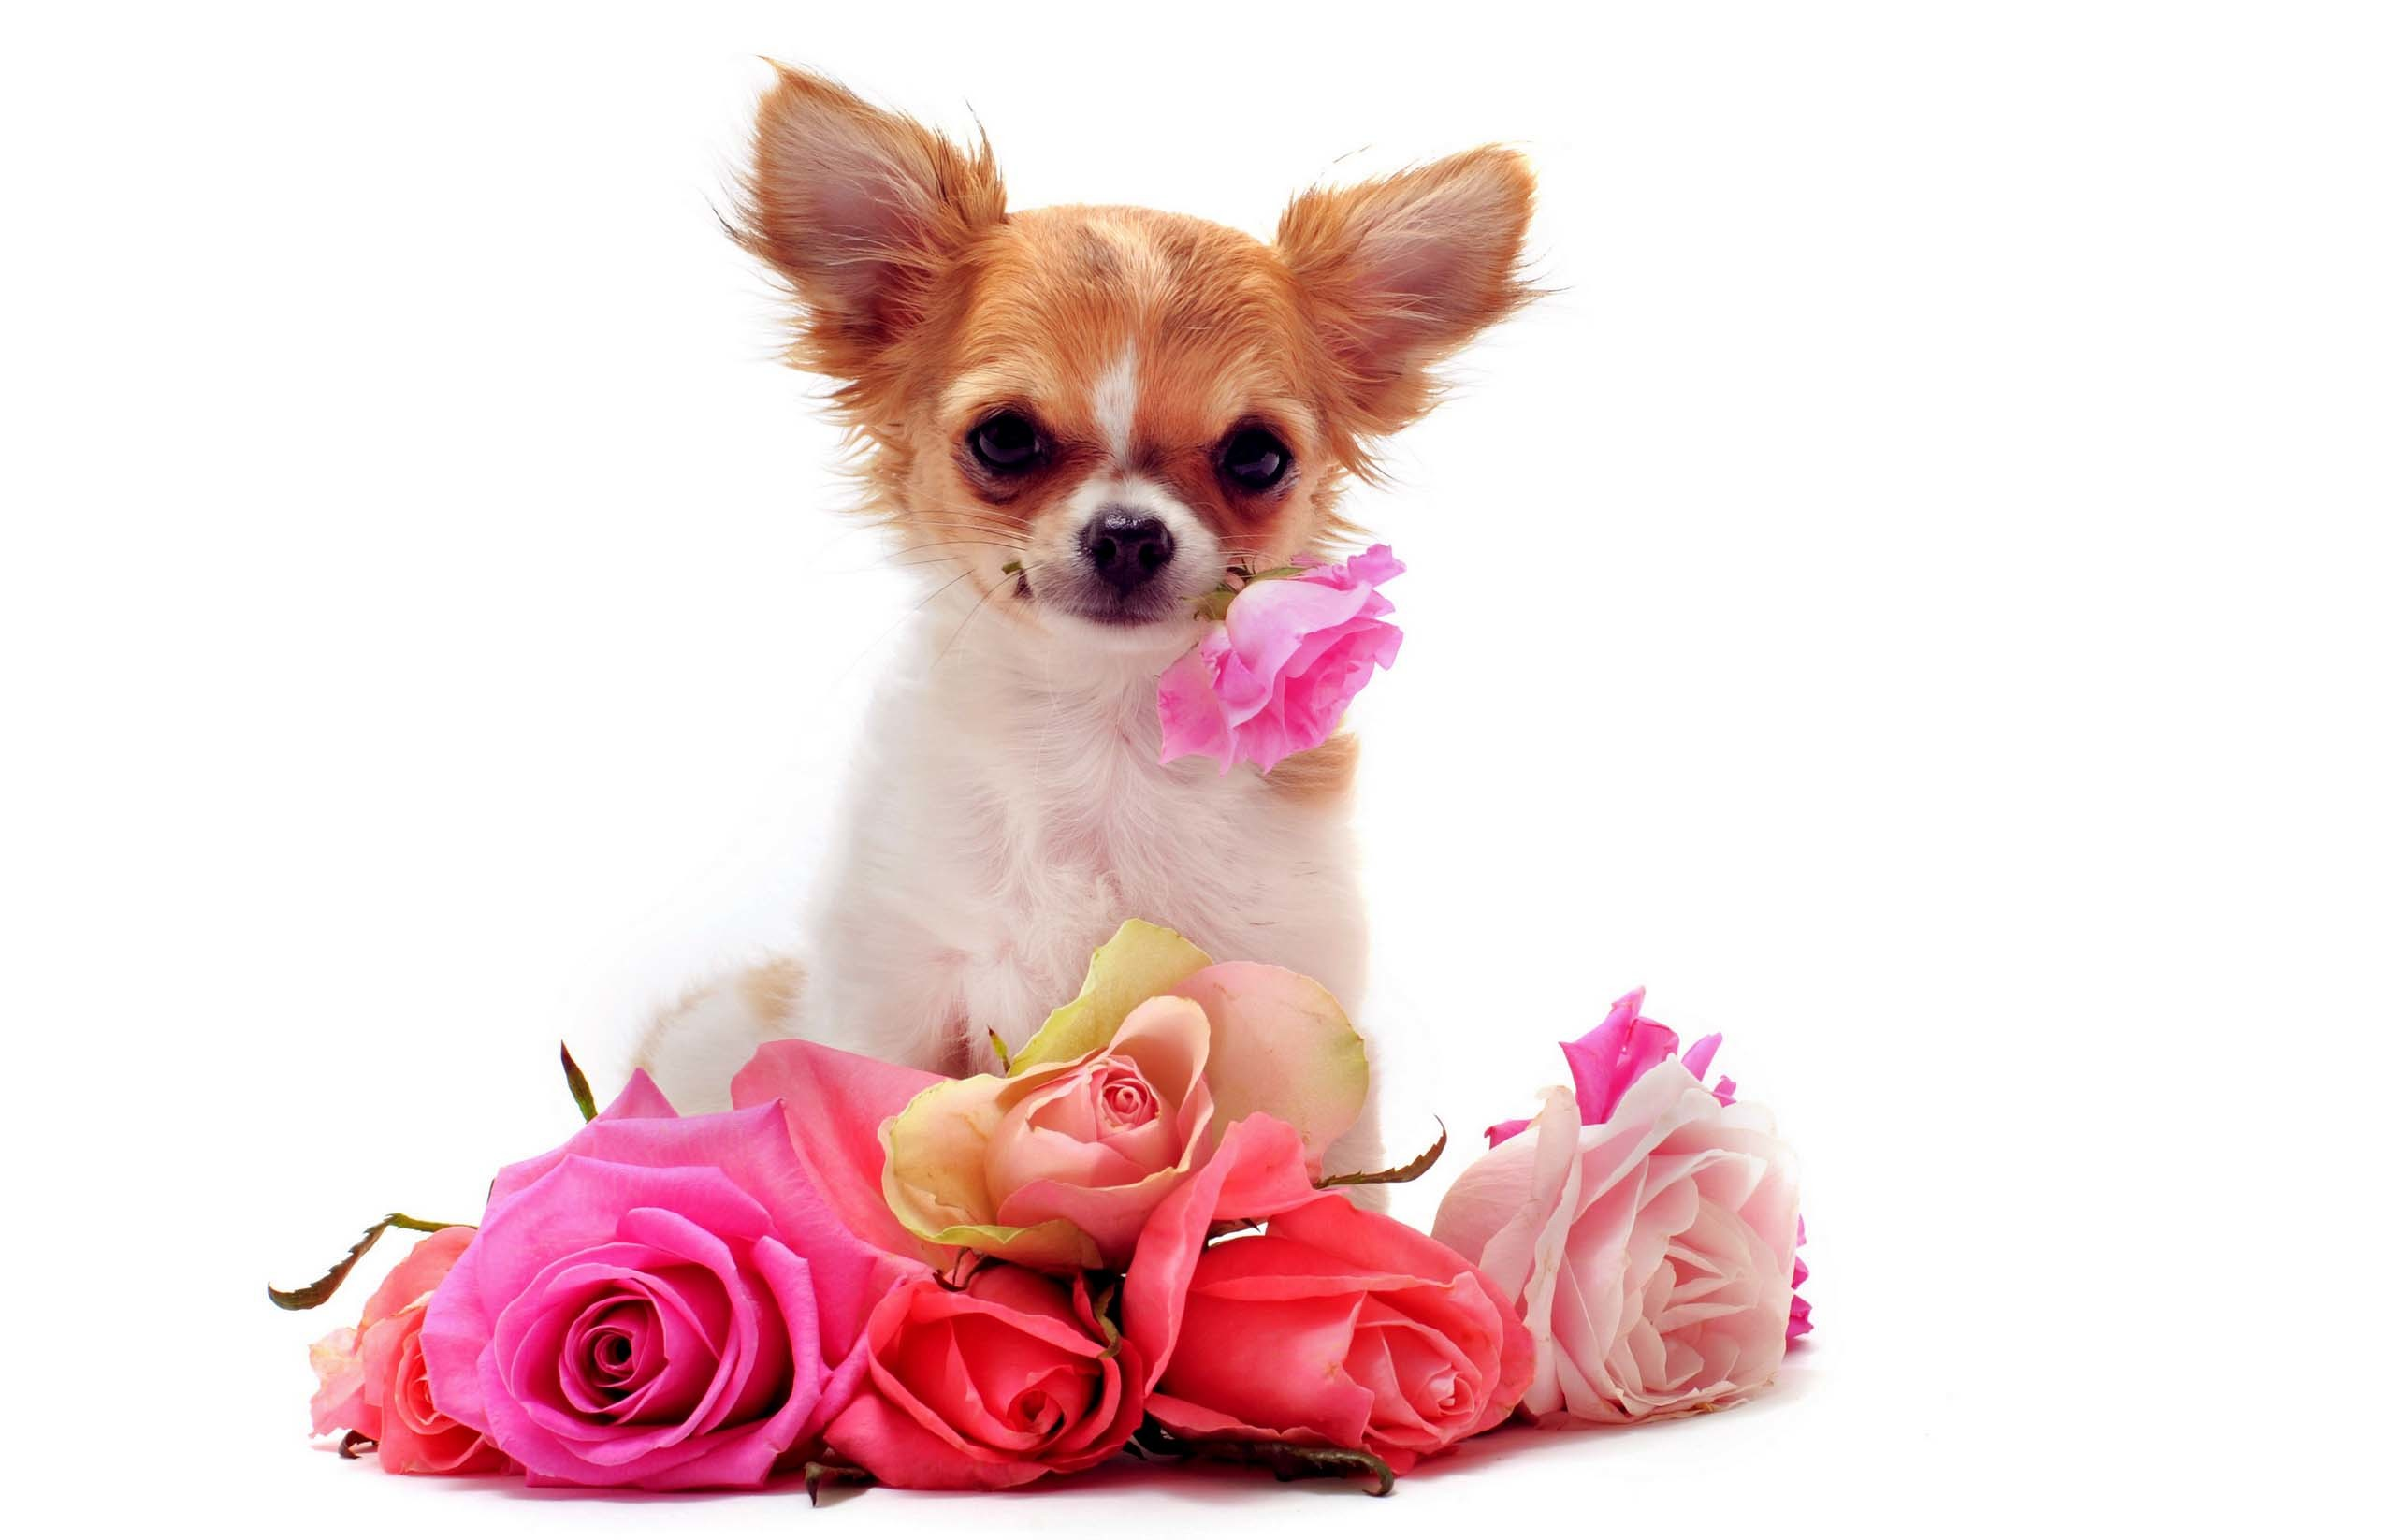 Filename: Chihuahua-dog-free-wallpaper.jpg